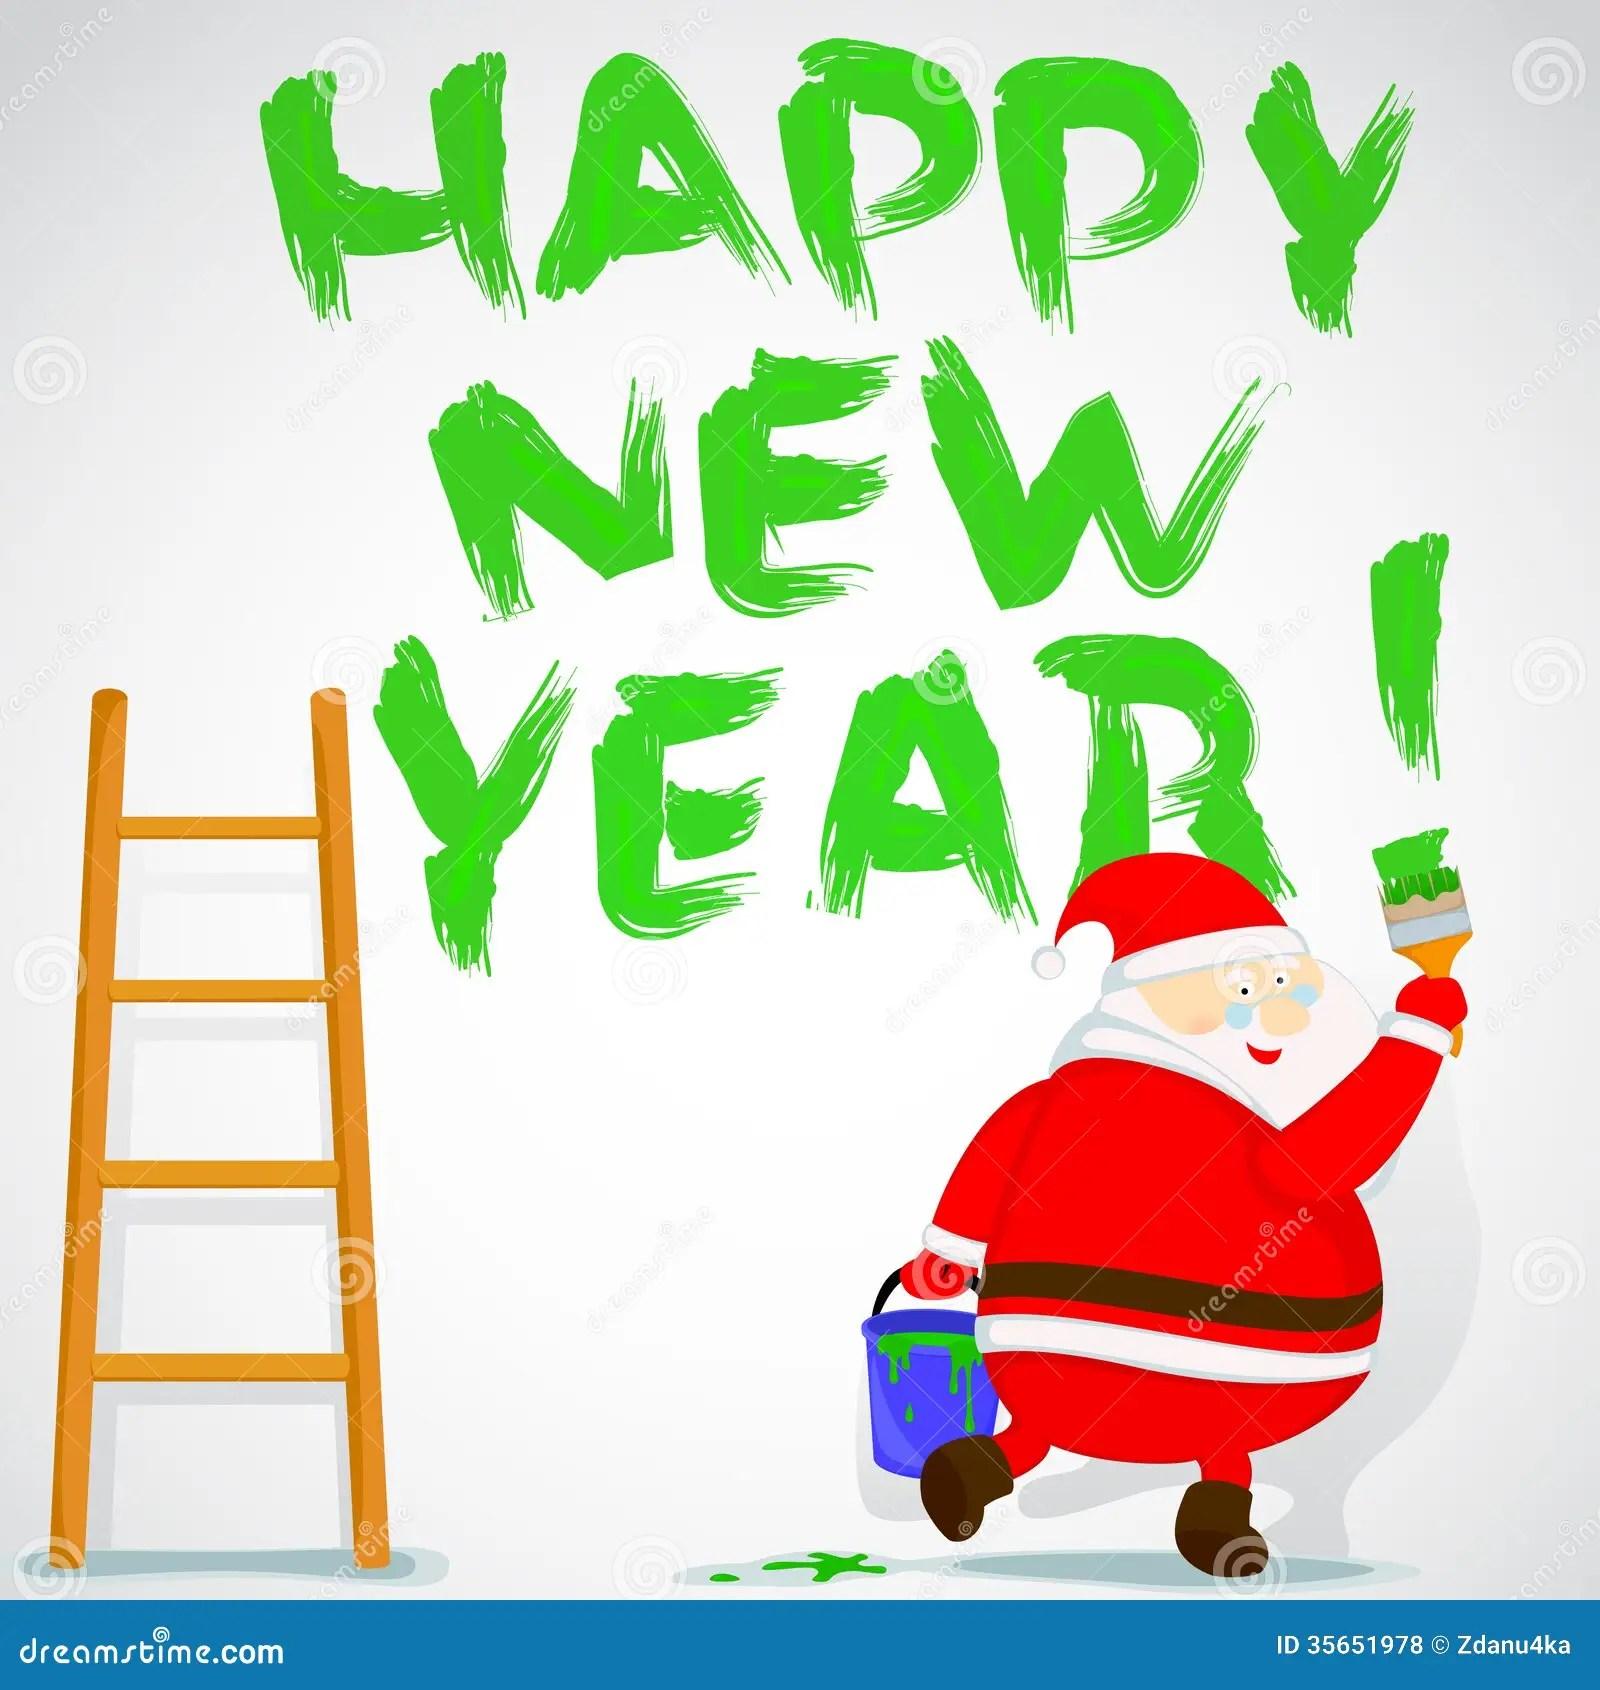 Happy New Year Royalty Free Stock Photos Image 35651978